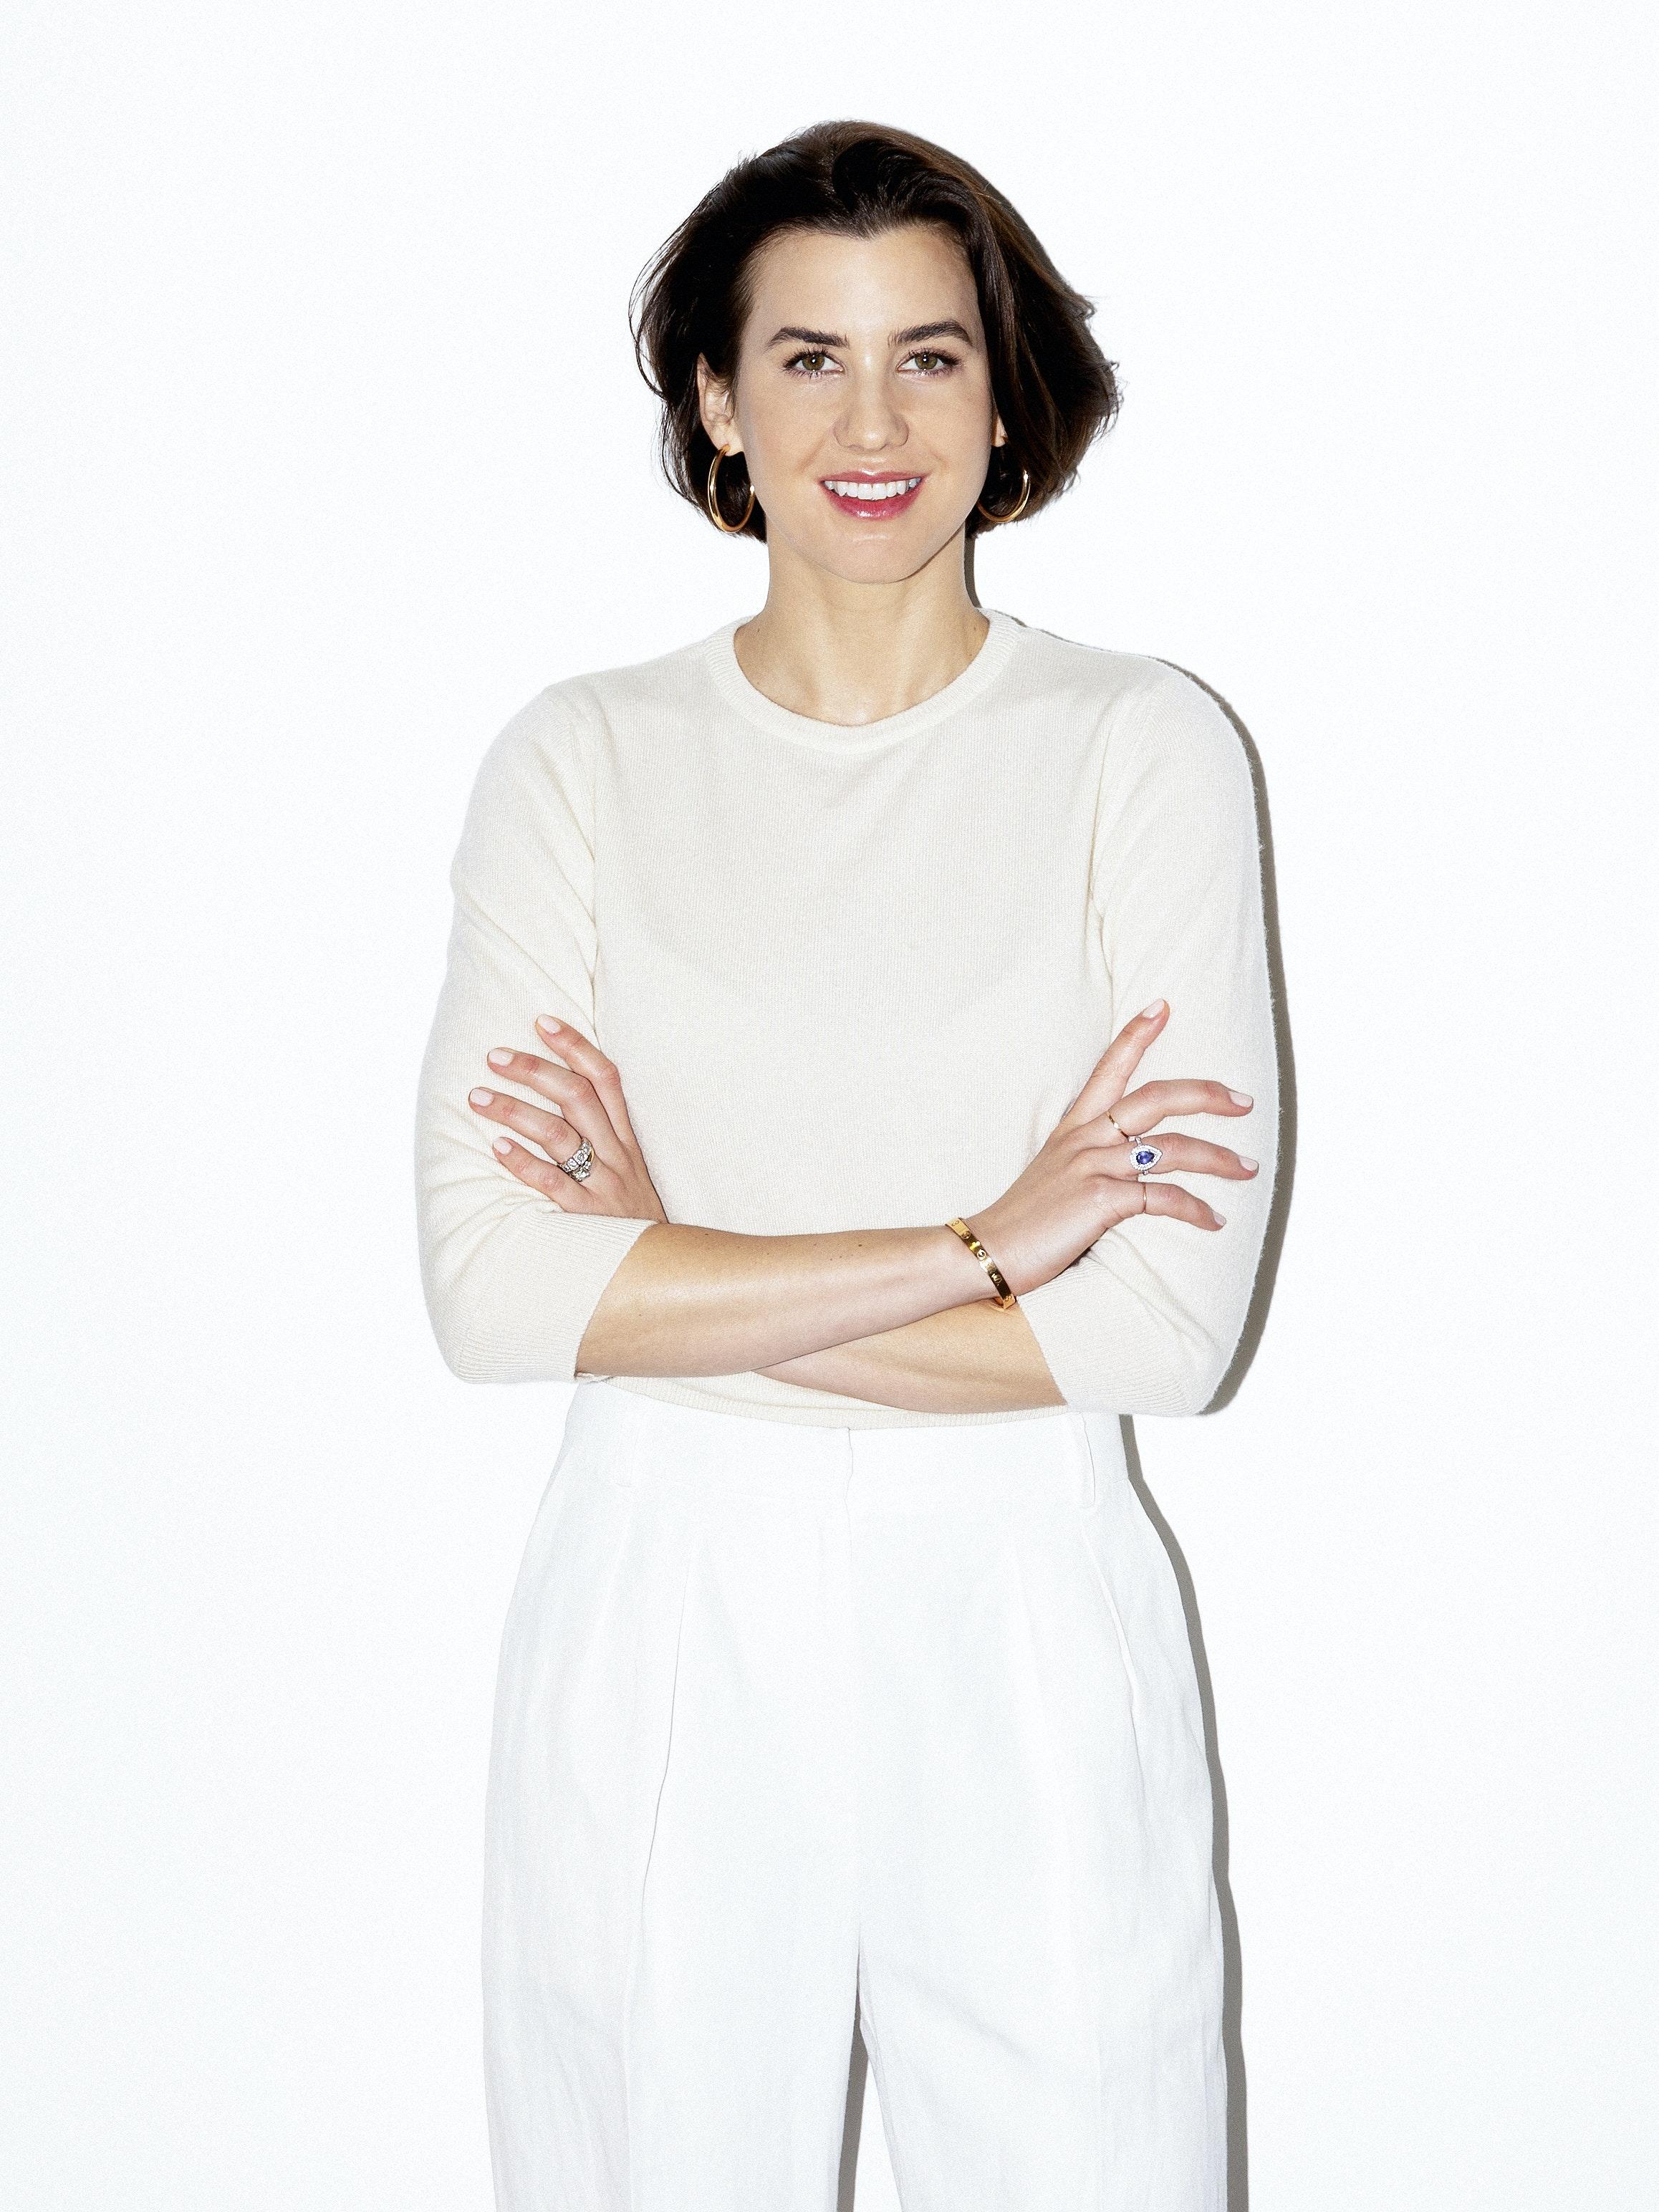 Melanie Bender the founding general manager of Versed